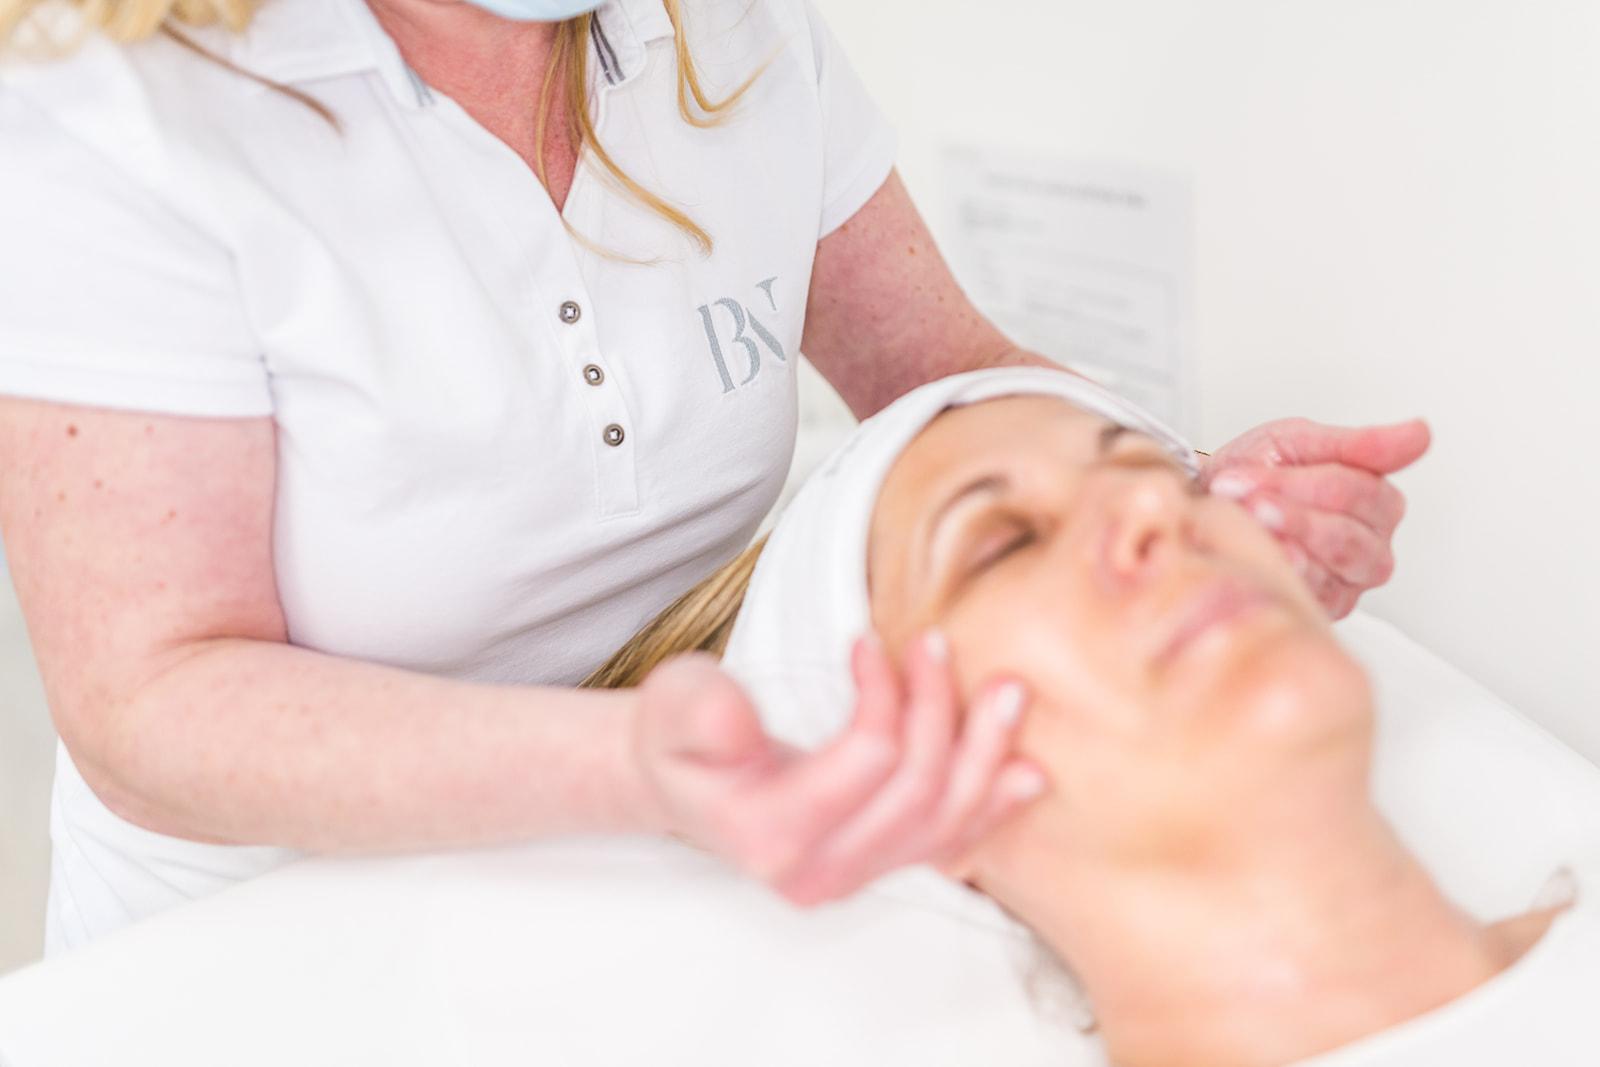 Medicinska kozmetologija i estetska dermatologija